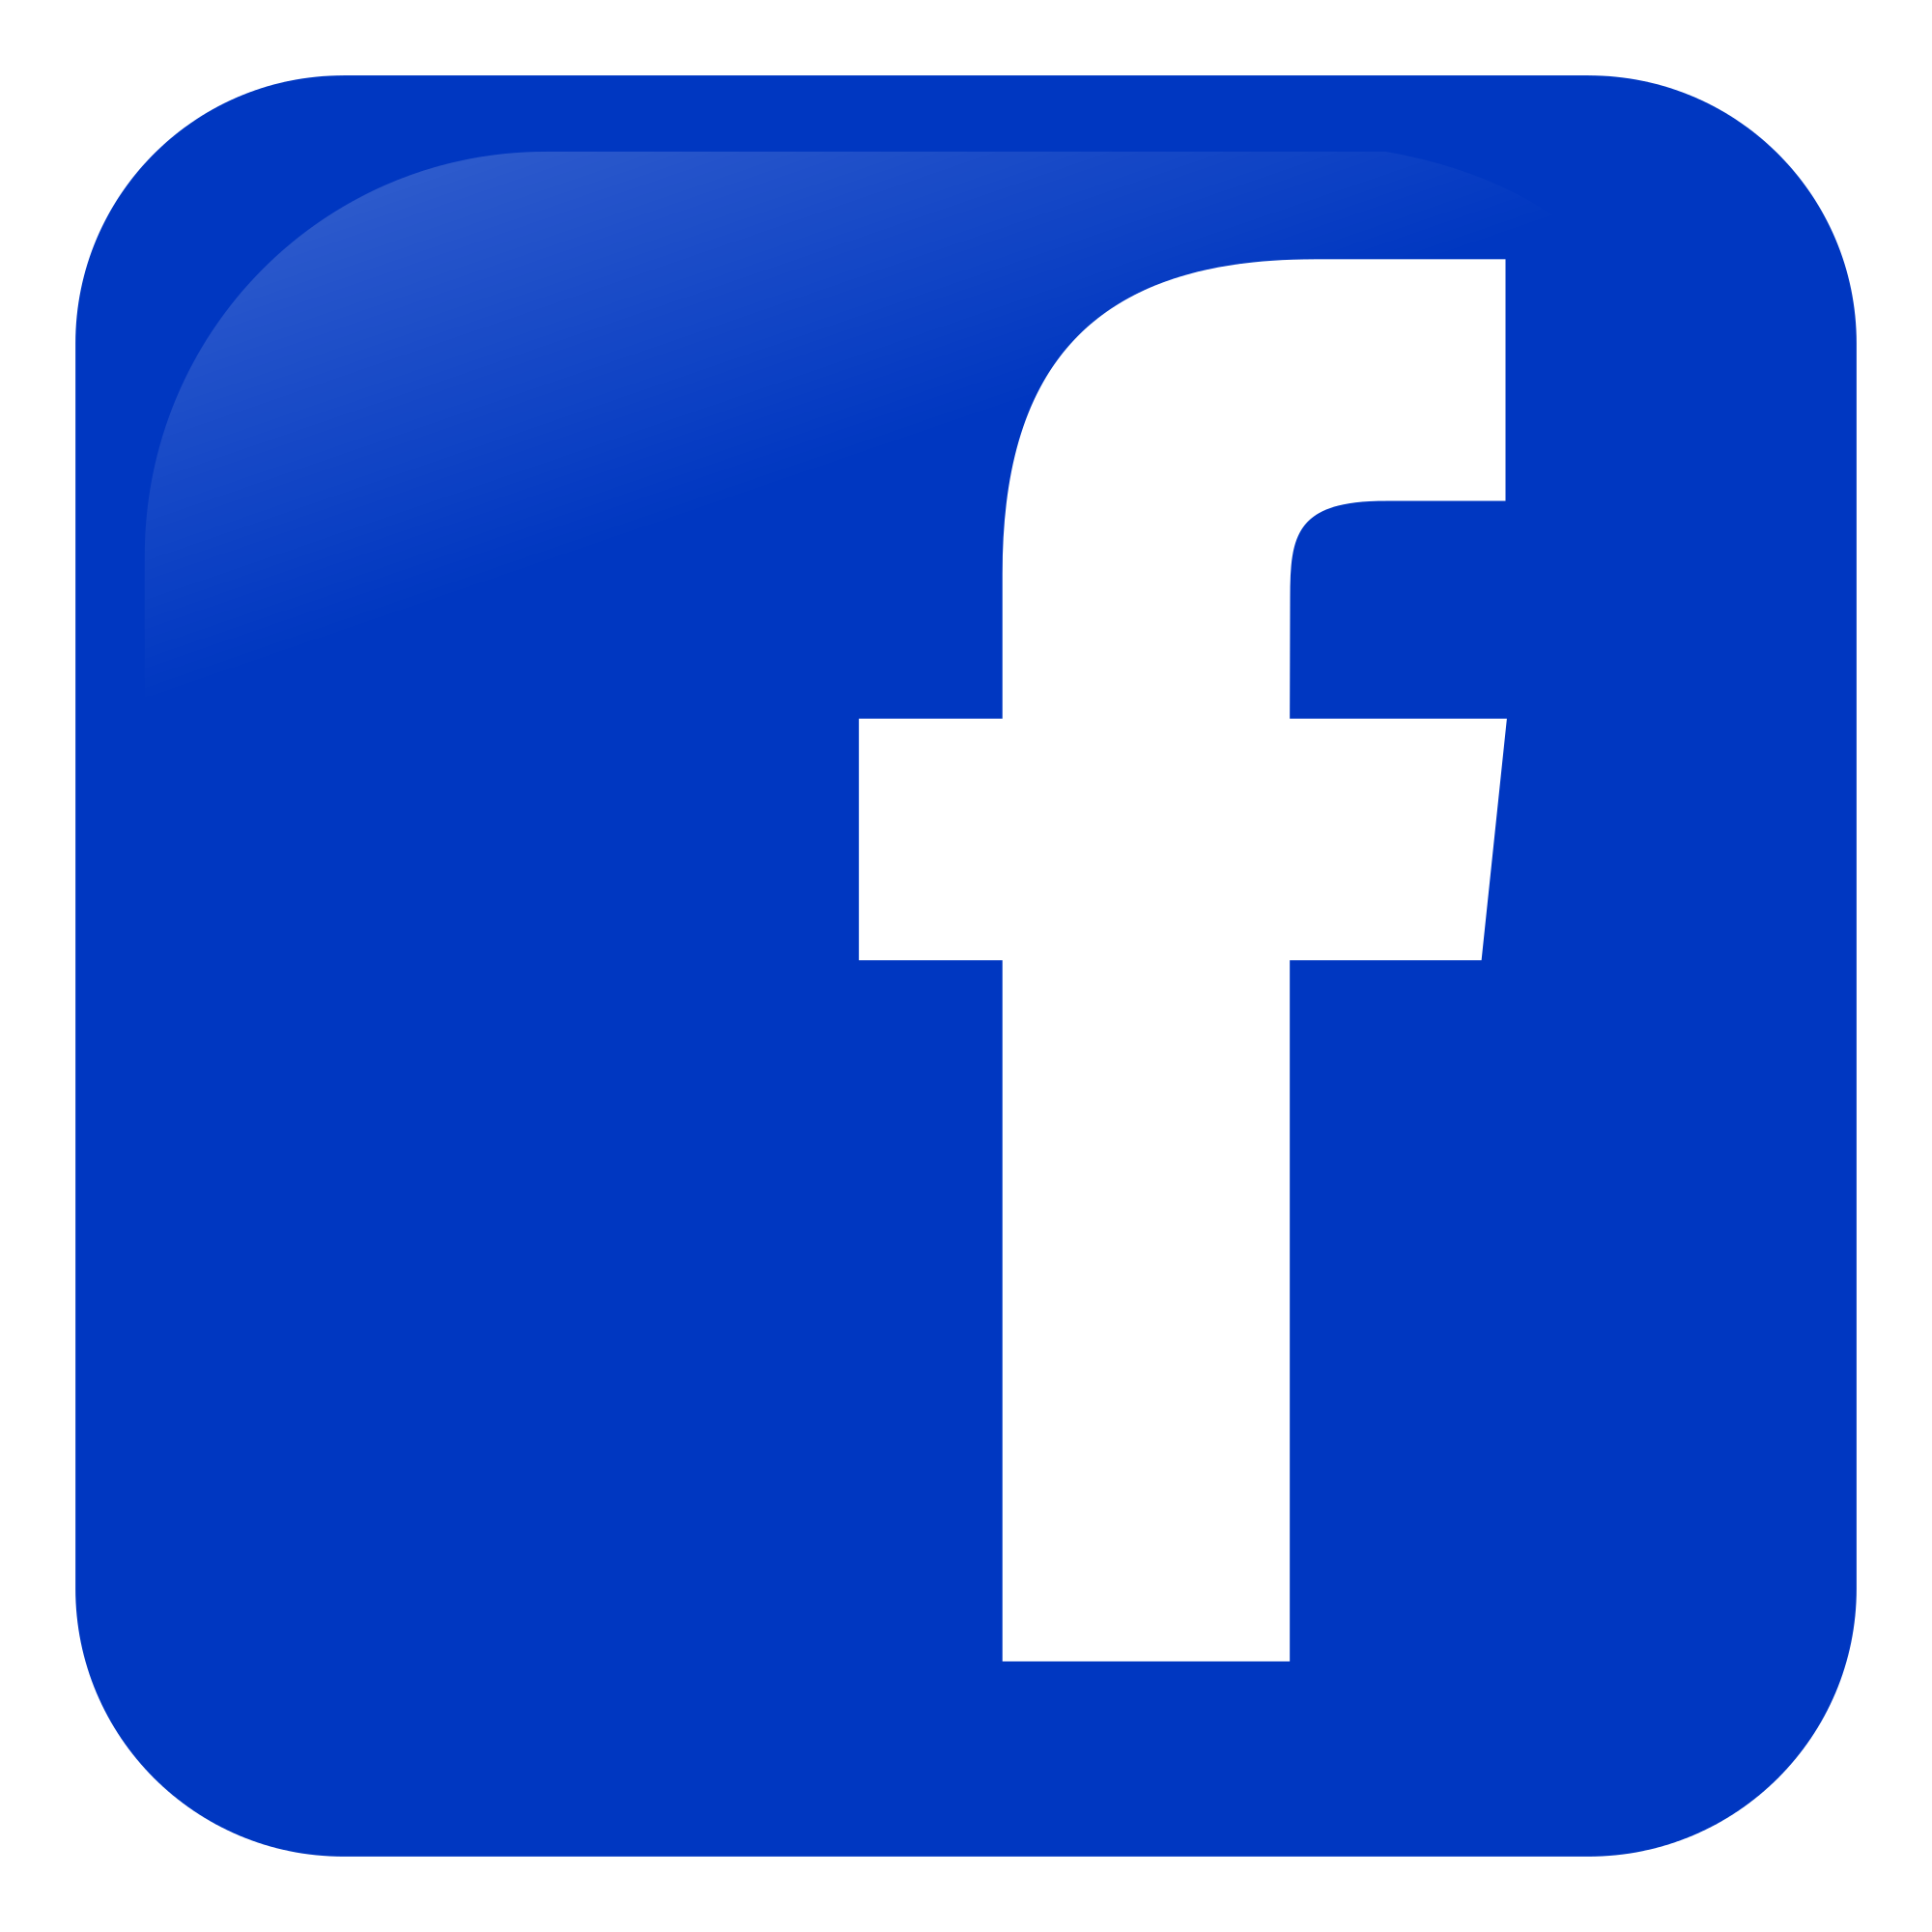 Facebook knapp_nobubbles